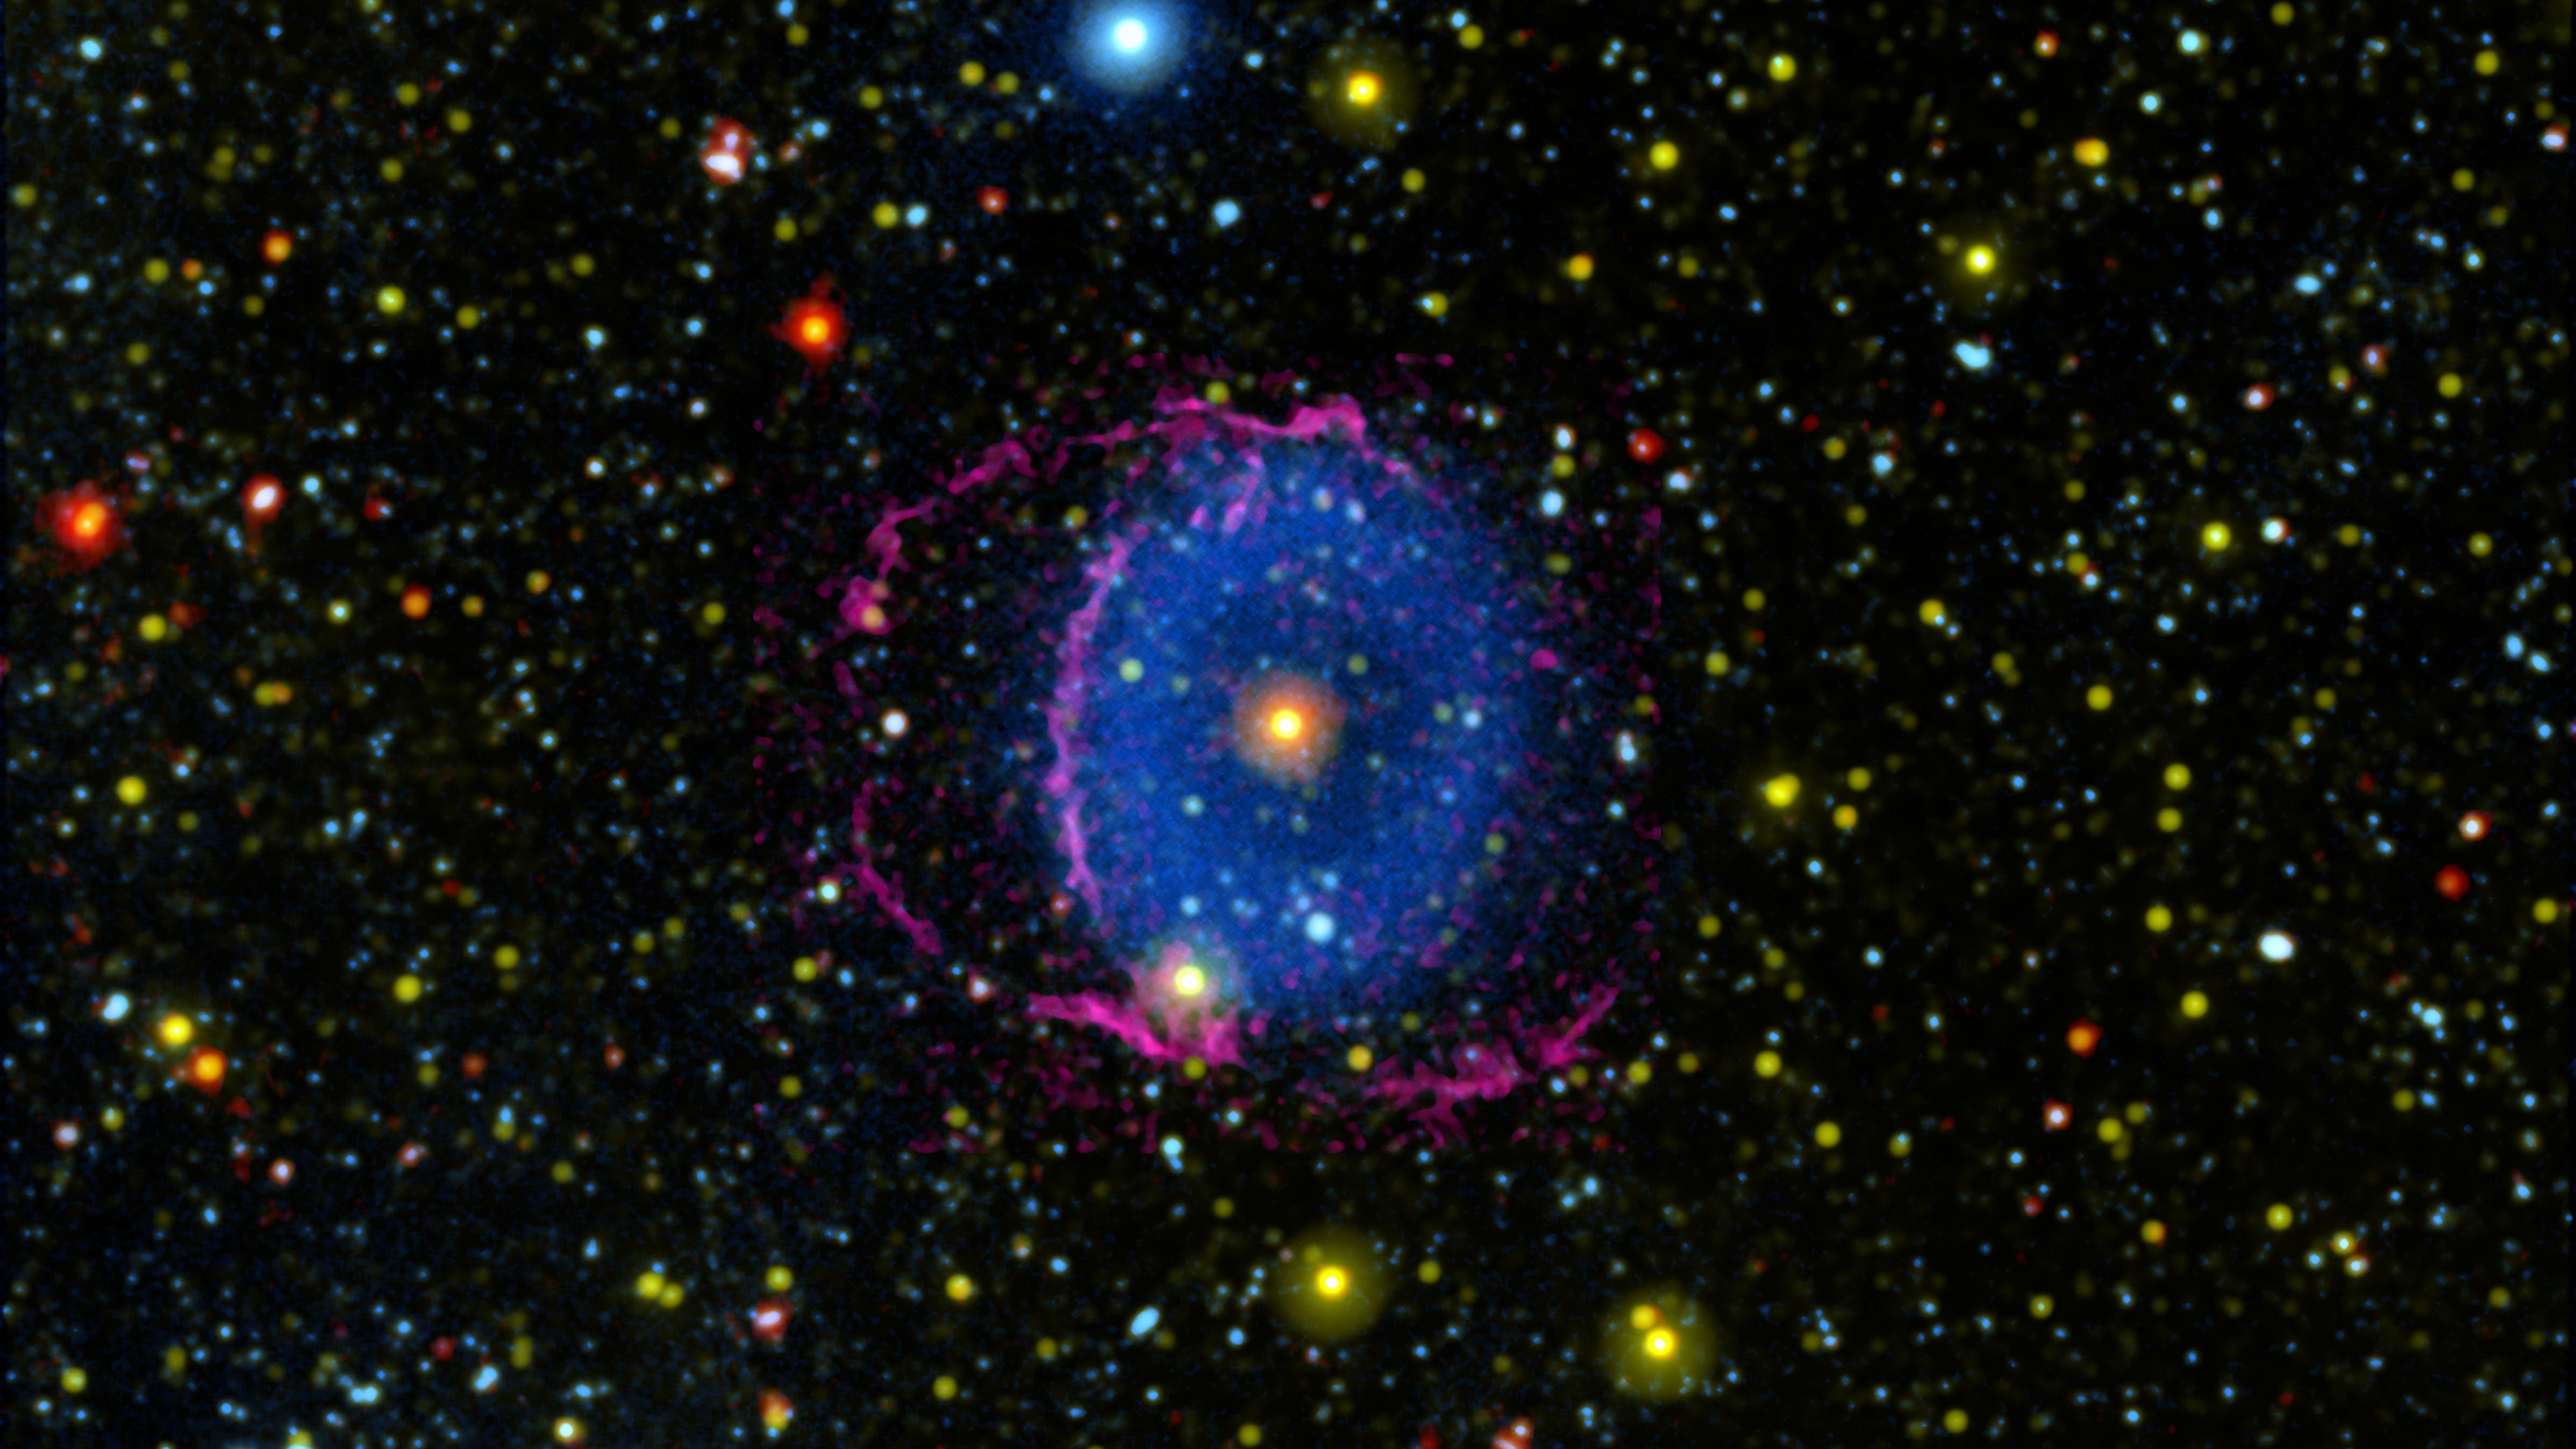 The dazzling Blue Ring Nebula